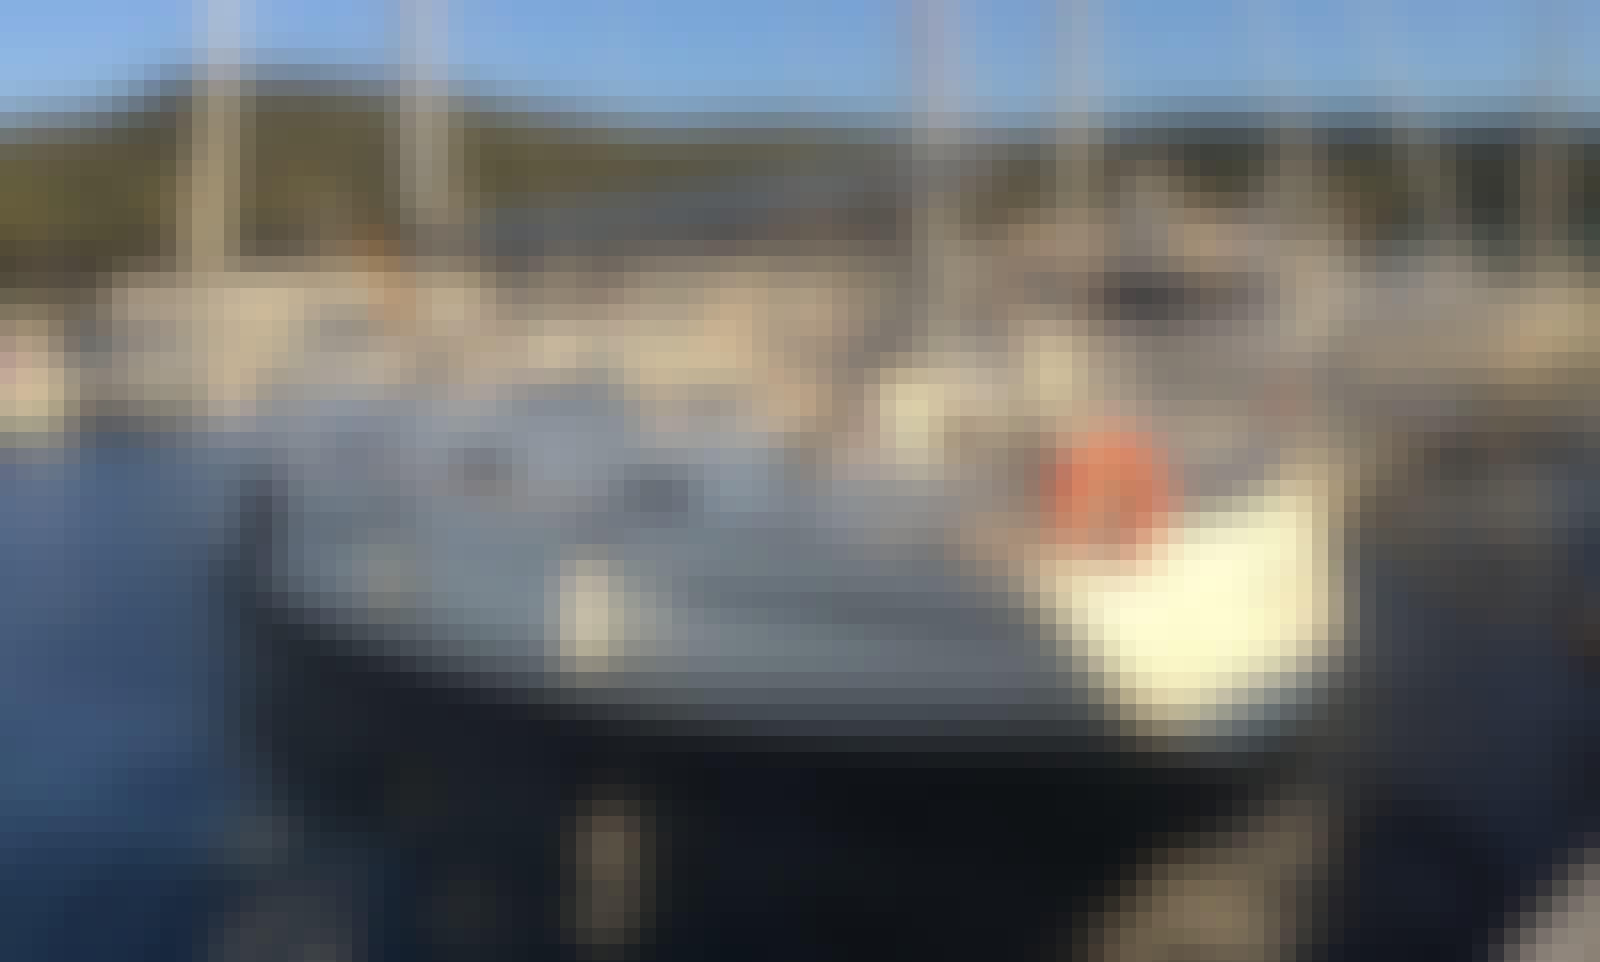 Bavaria Cruiser 36 Cruising Monohull Charter for 4 People in Maristella, Sardegna